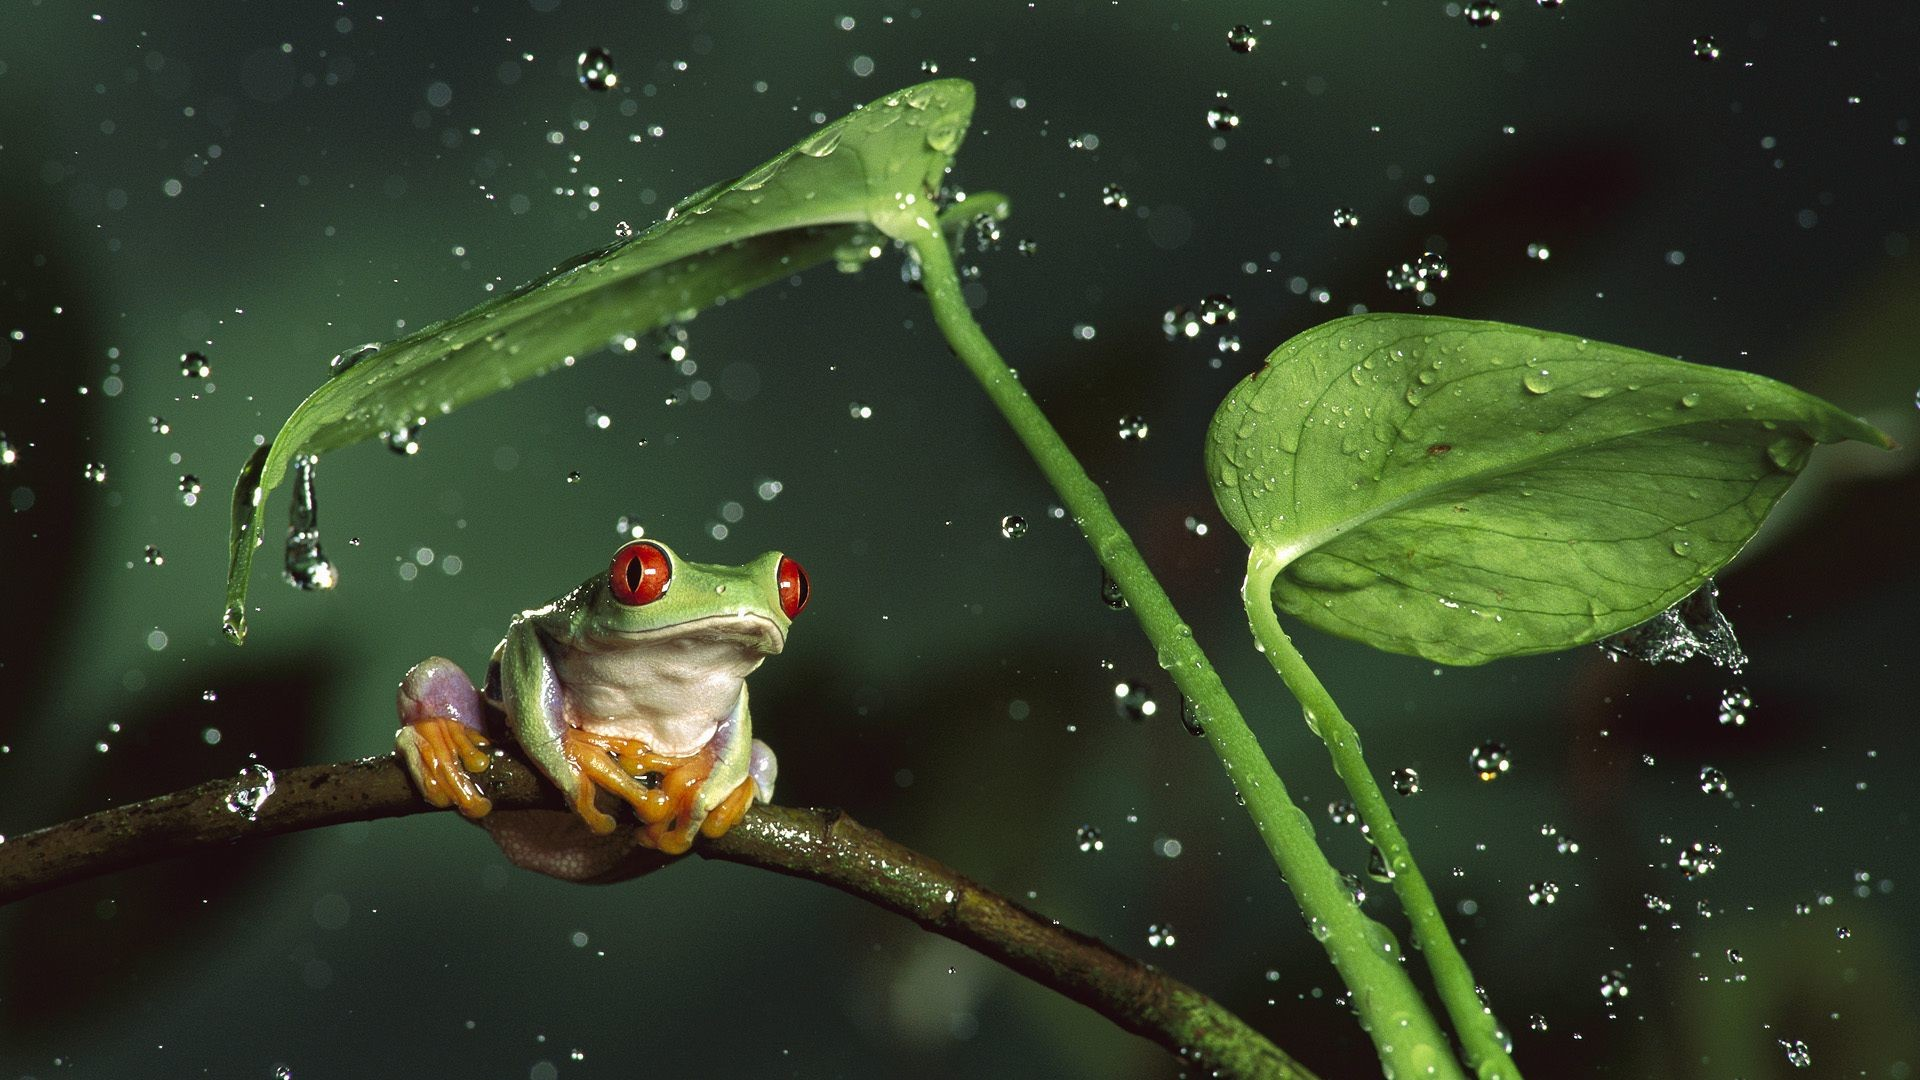 Cute Lock Screen Wallpapers Desktop Funny Frog Wallpaper 183 ①